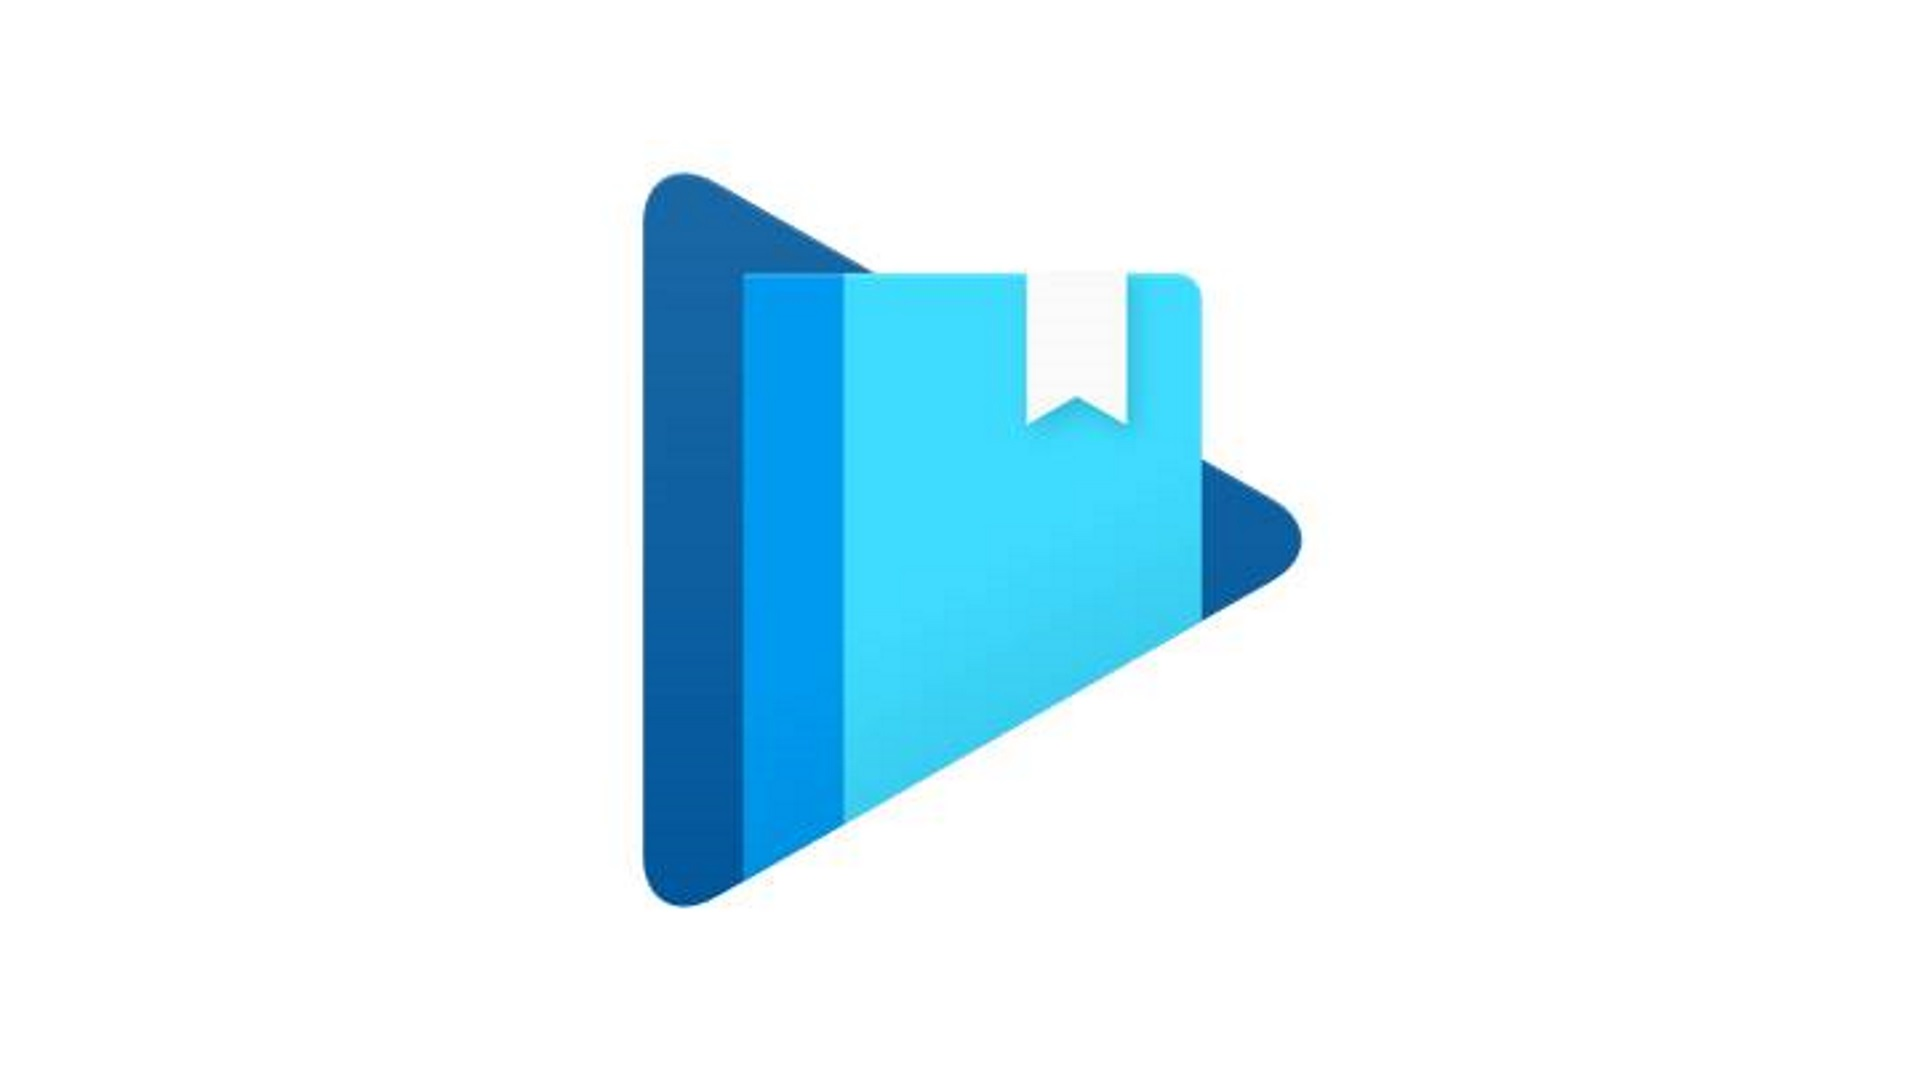 「Google Play ブックス」400円分のクーポンが一部配布中、「KEYone」ユーザー必見!